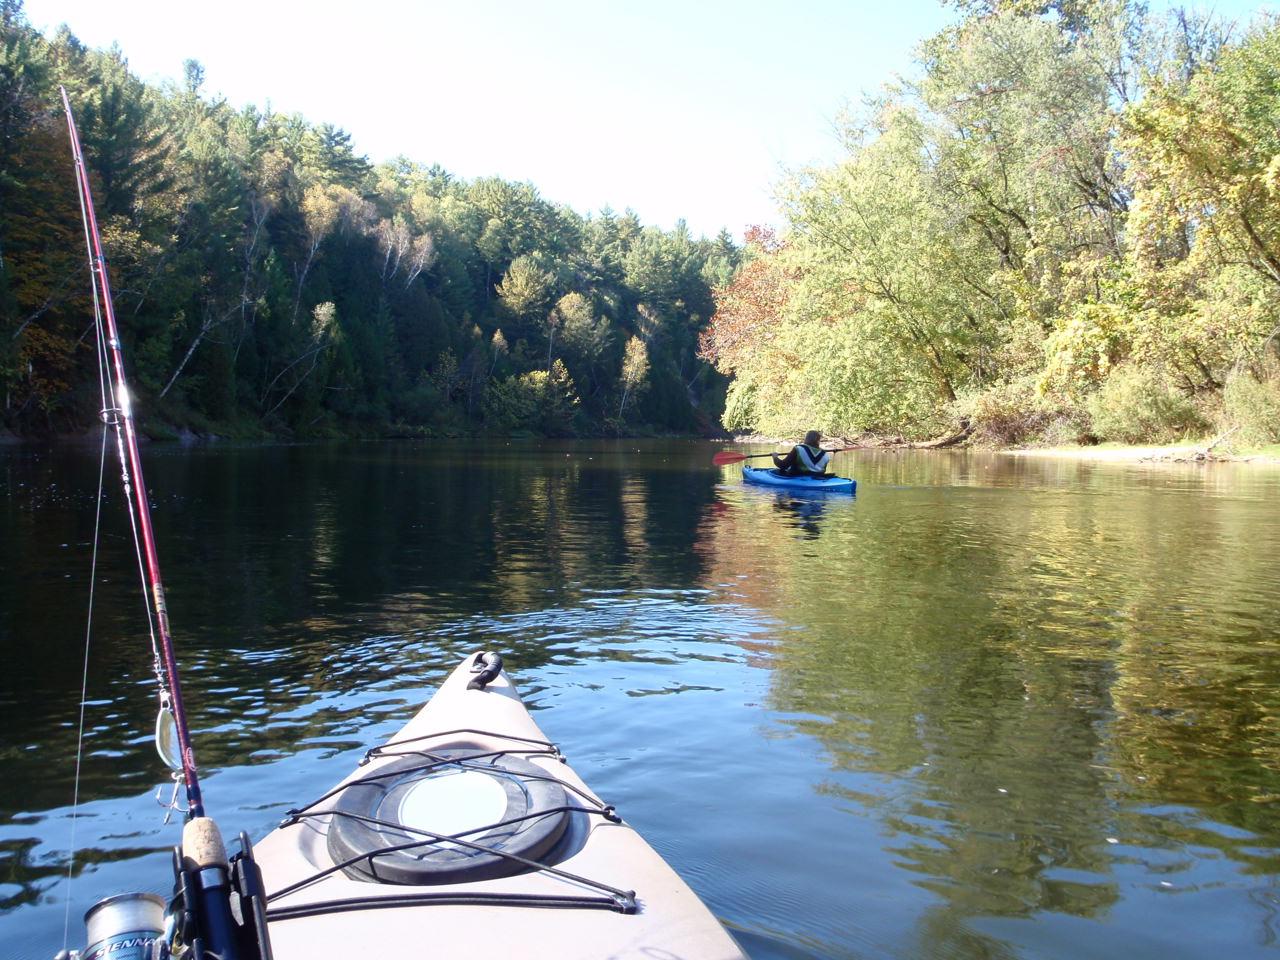 Muskegon river kayak fishing midwest academy consulting for Muskegon river fishing